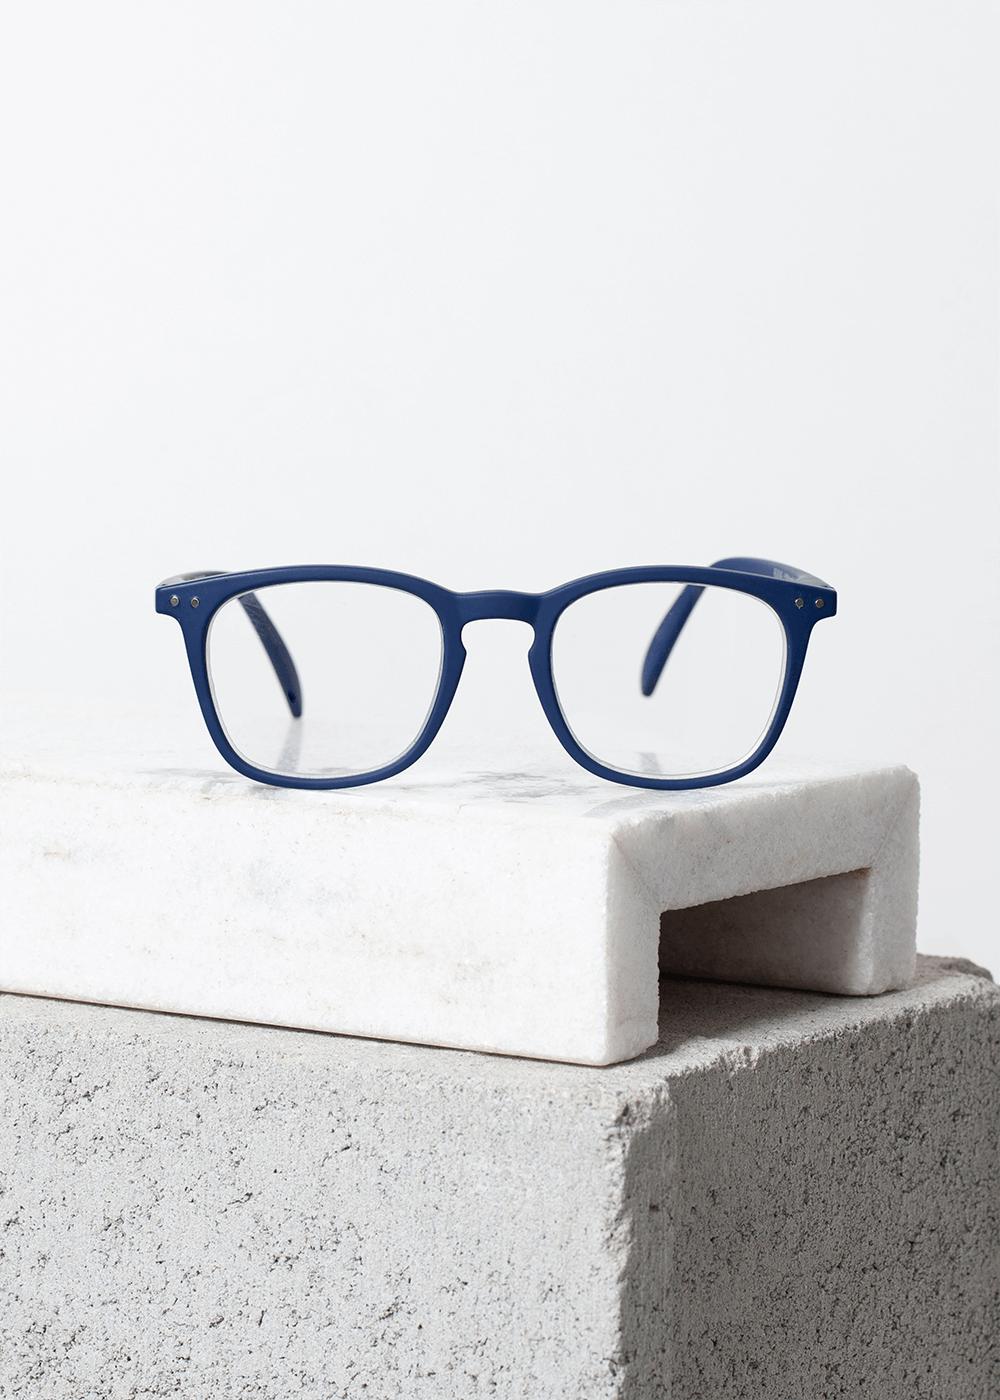 Óculos Para Leitura Navy Blue E Azul 1,5